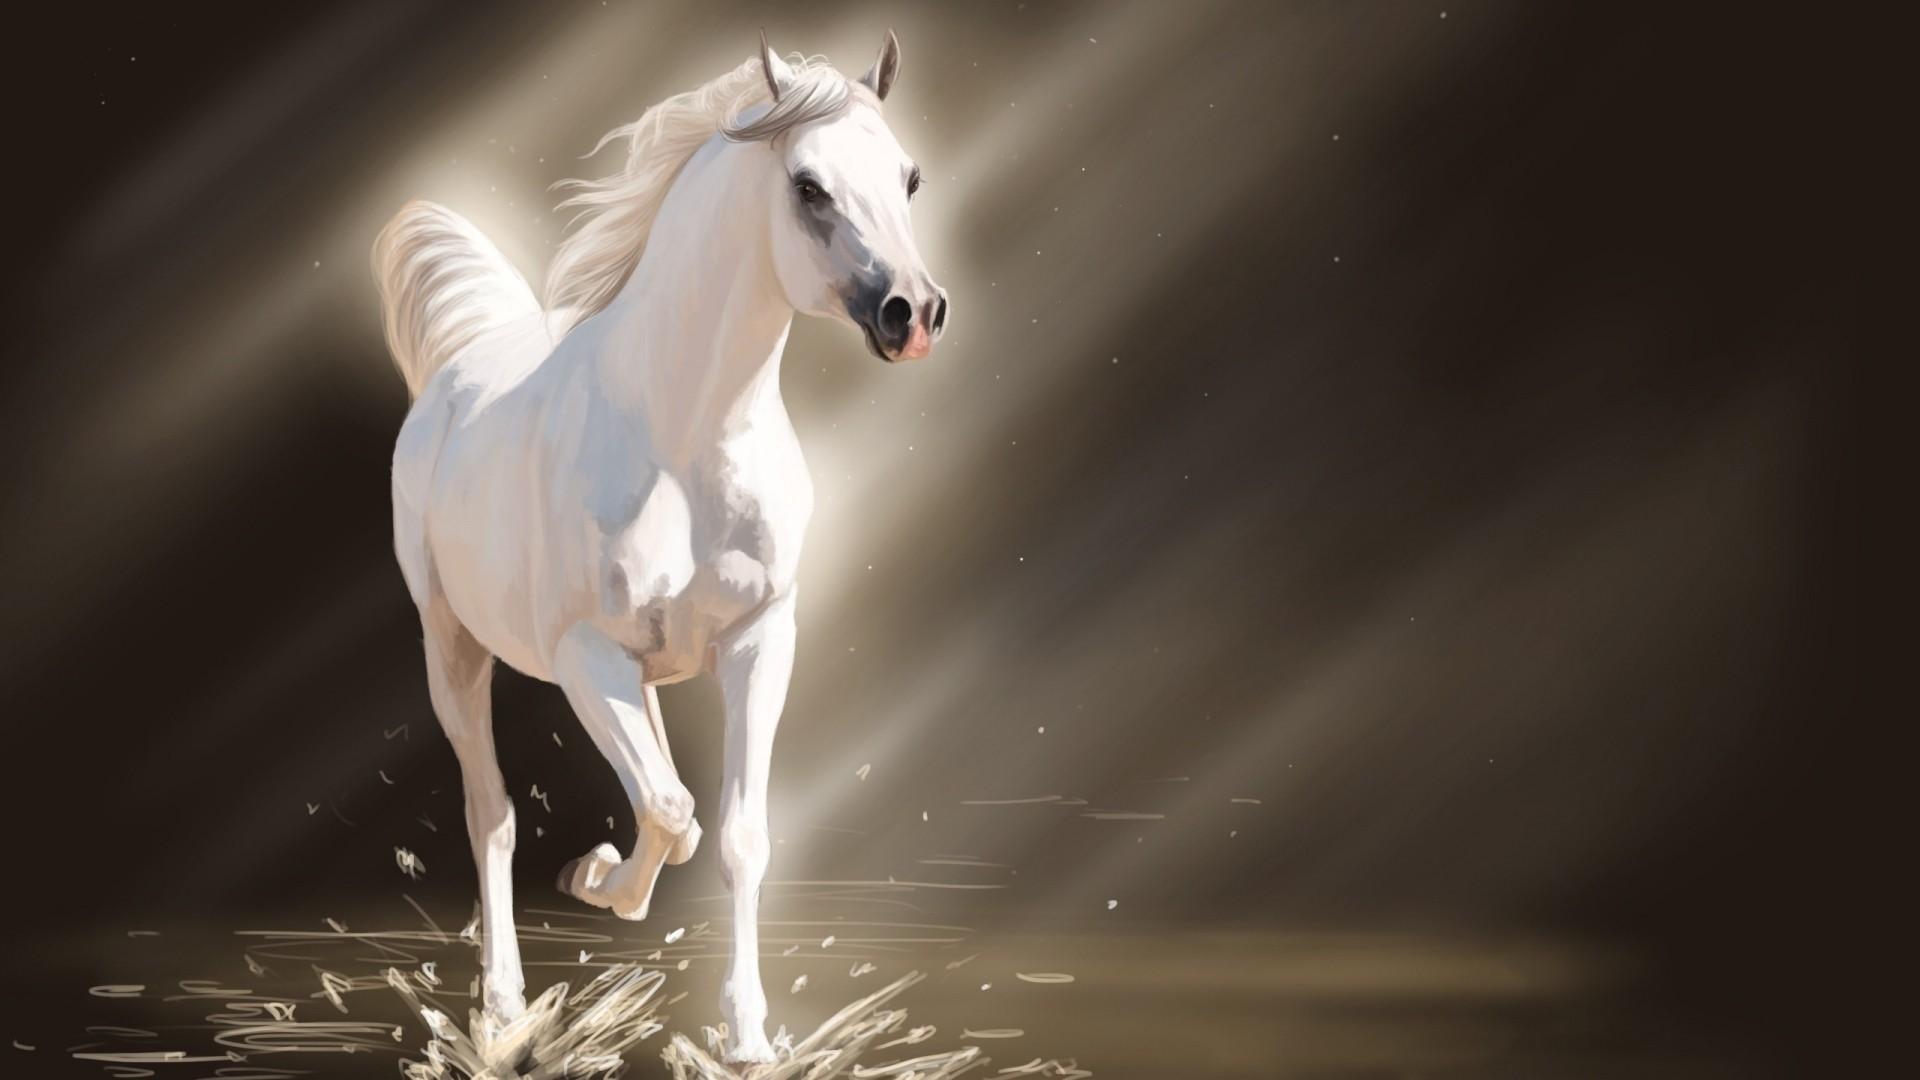 White Horse PC Wallpaper